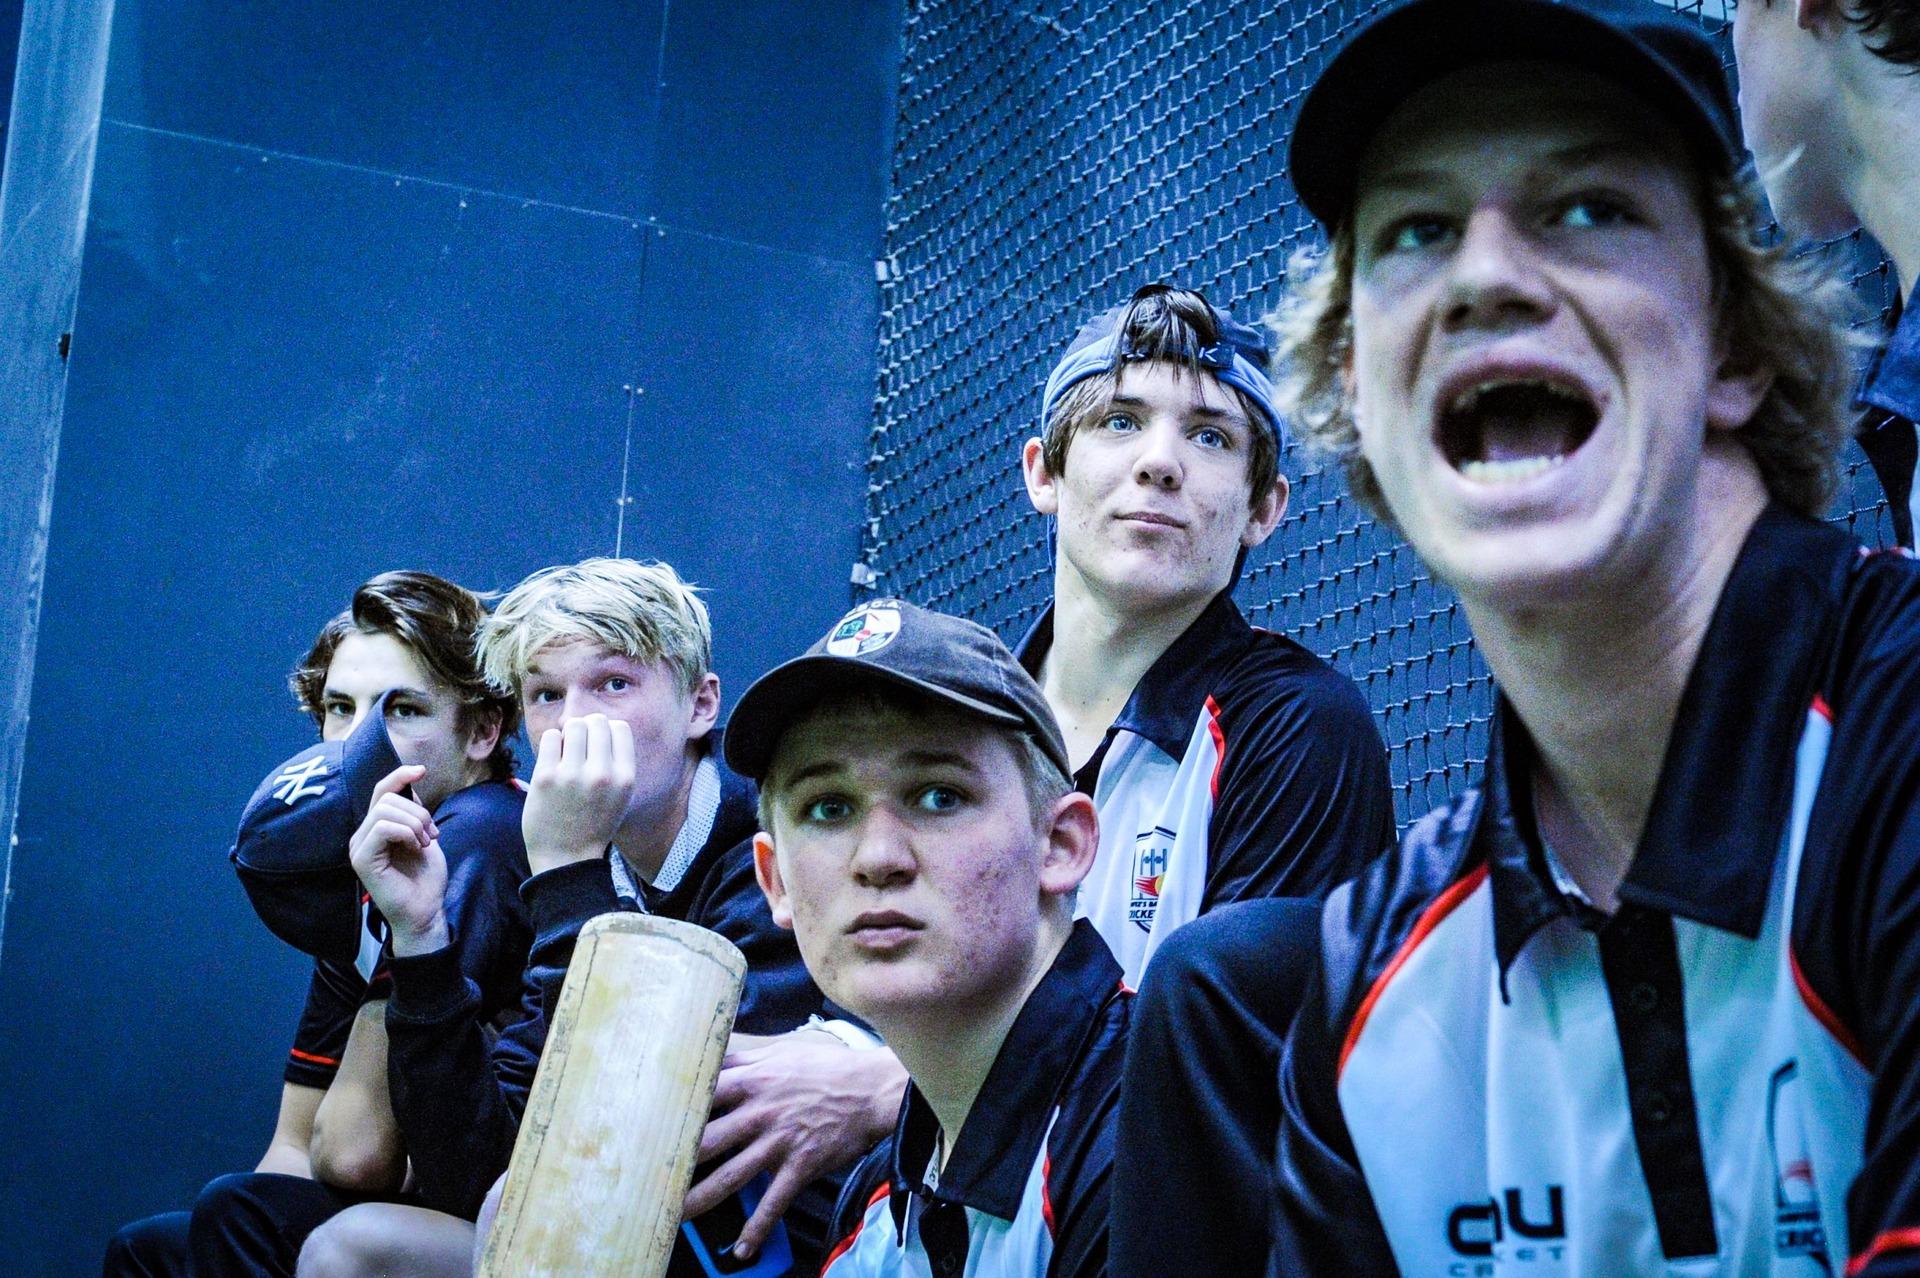 Indoor cricket: Central flag flyers battle at junior nationals despite not having facilities in Napier